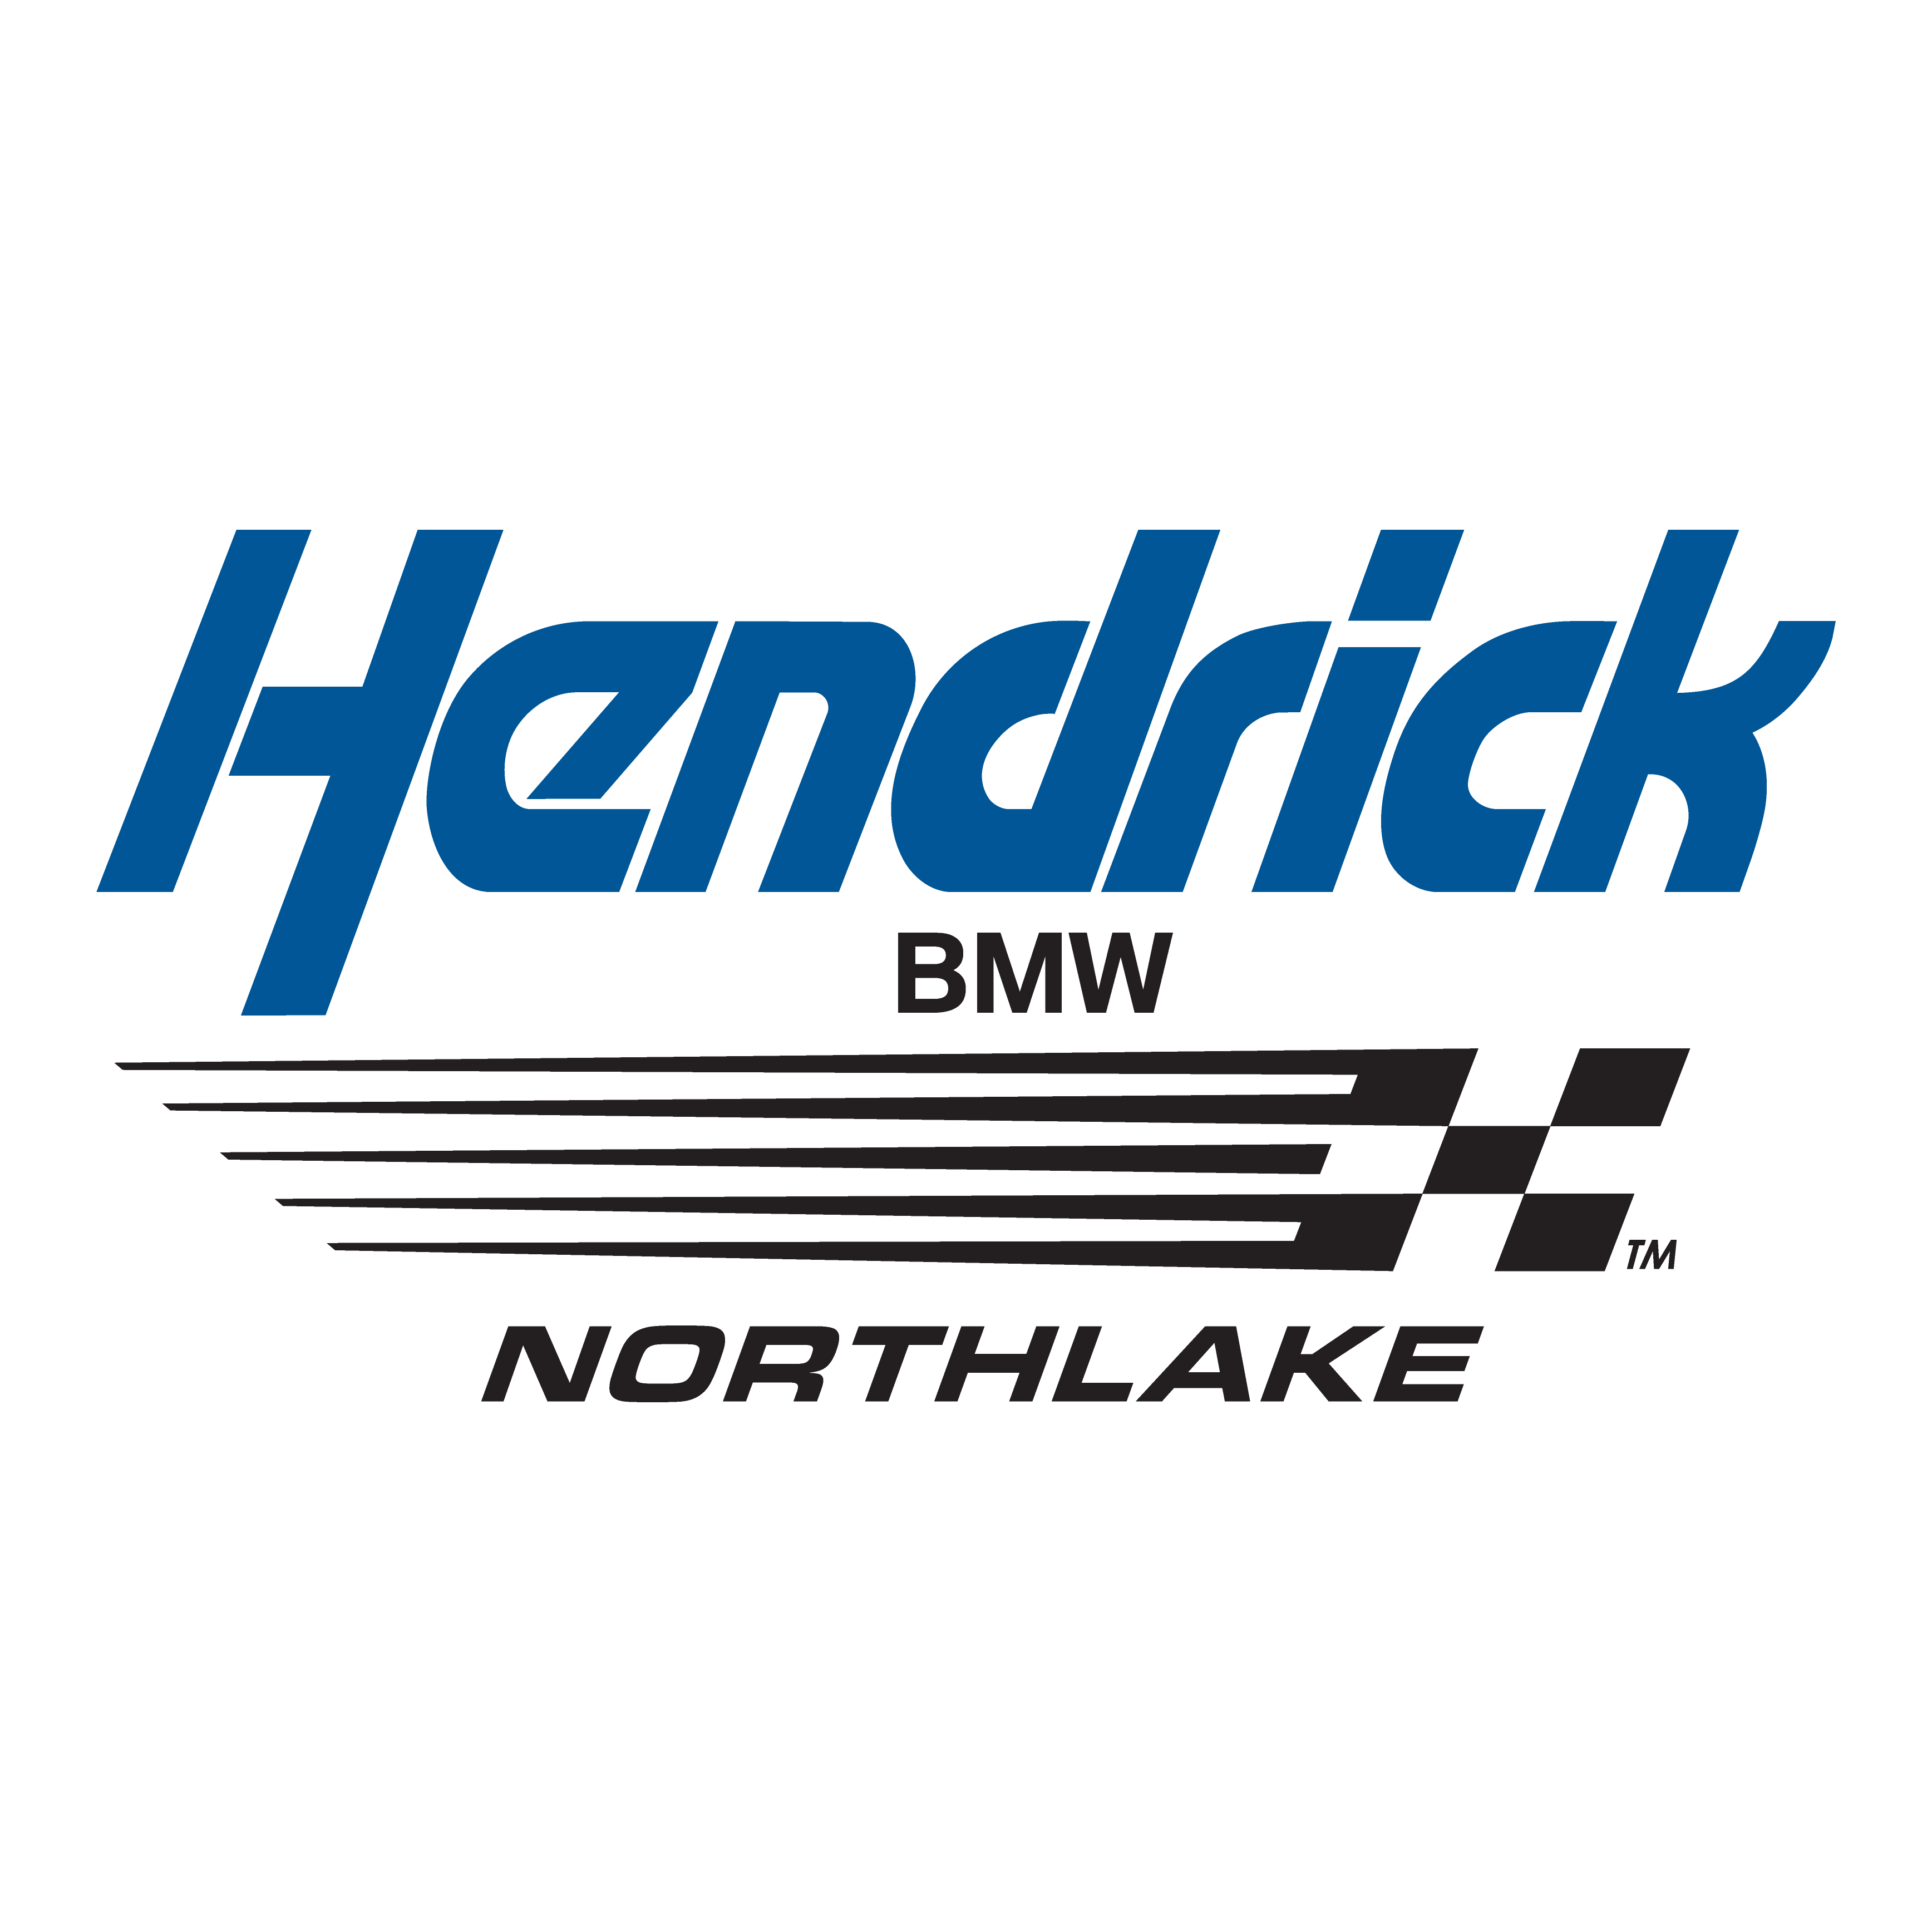 Hendrick BMW Northlake